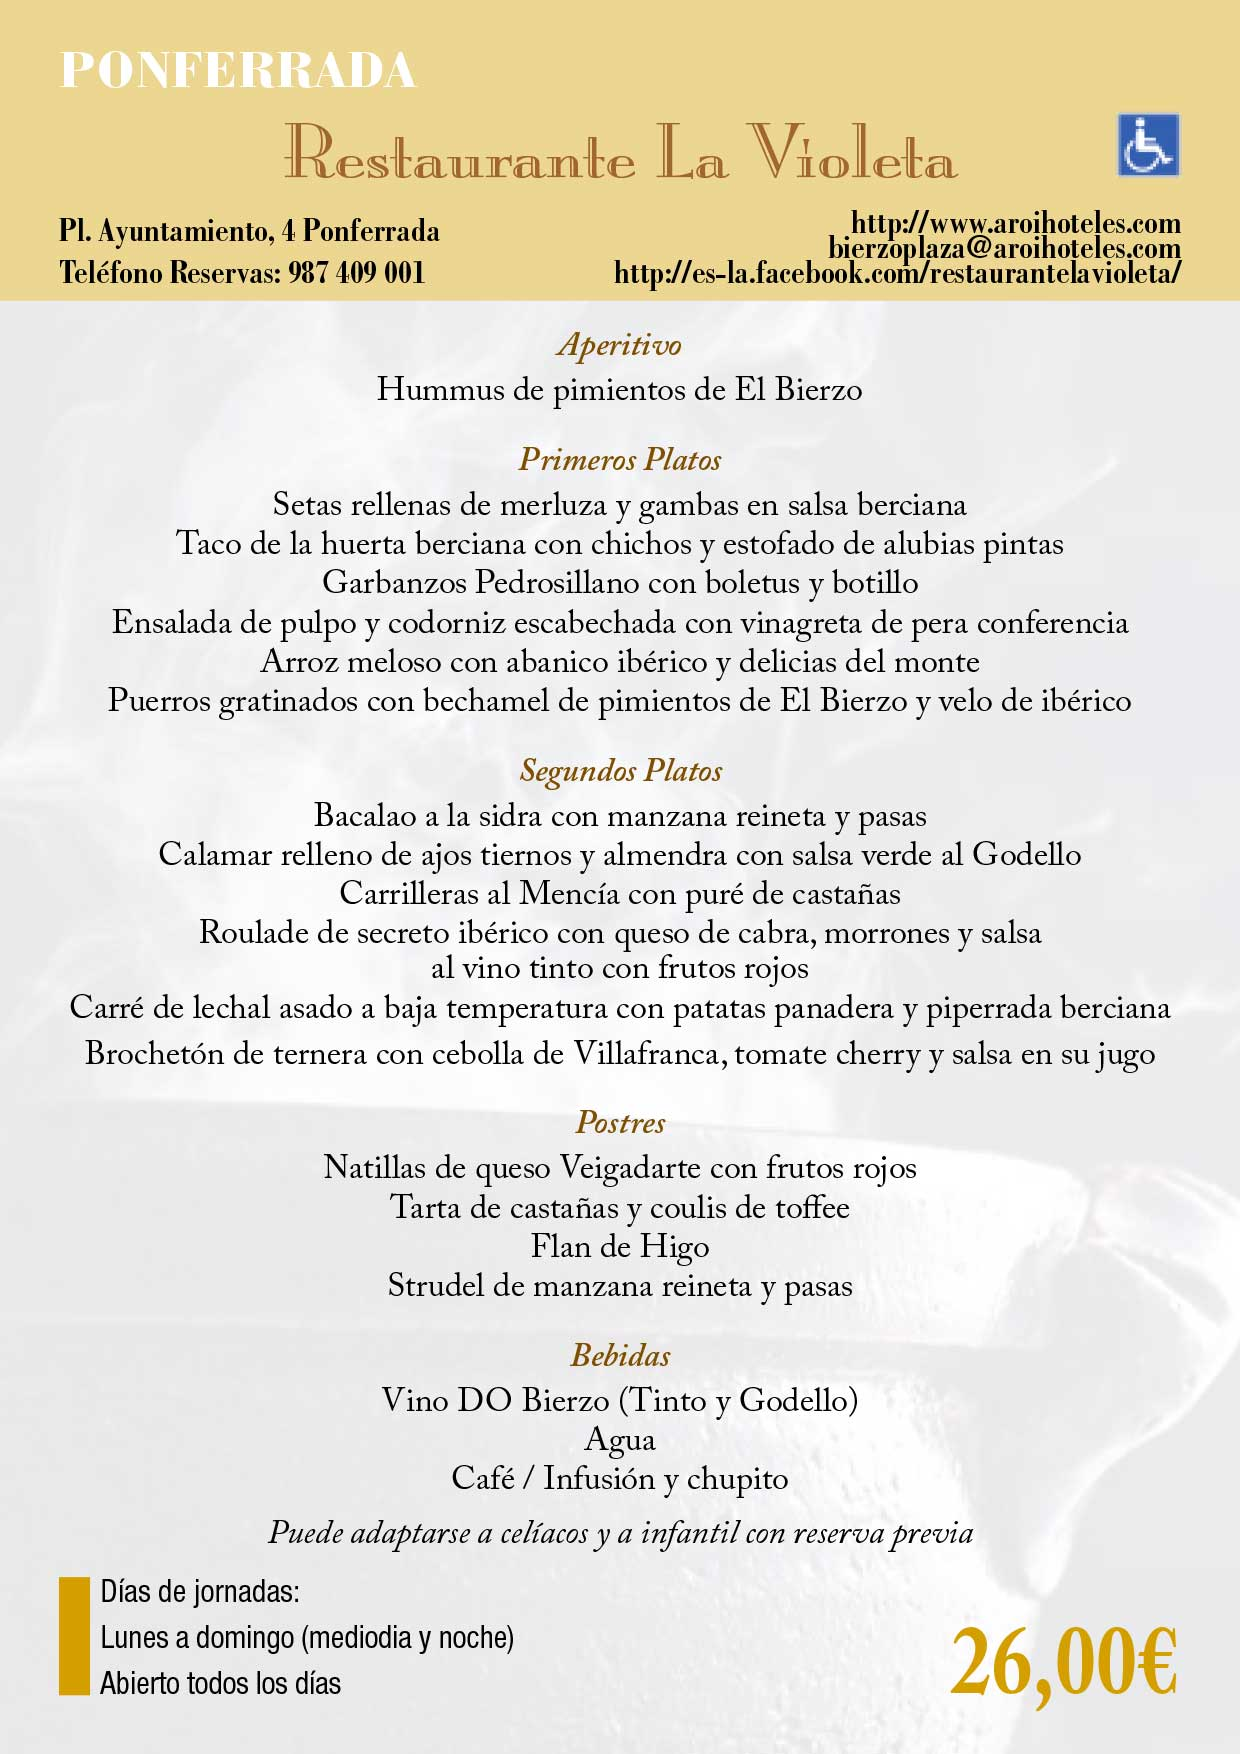 XXXIII Jornadas gastronómicas del Bierzo 2017. Restaurantes participantes 25